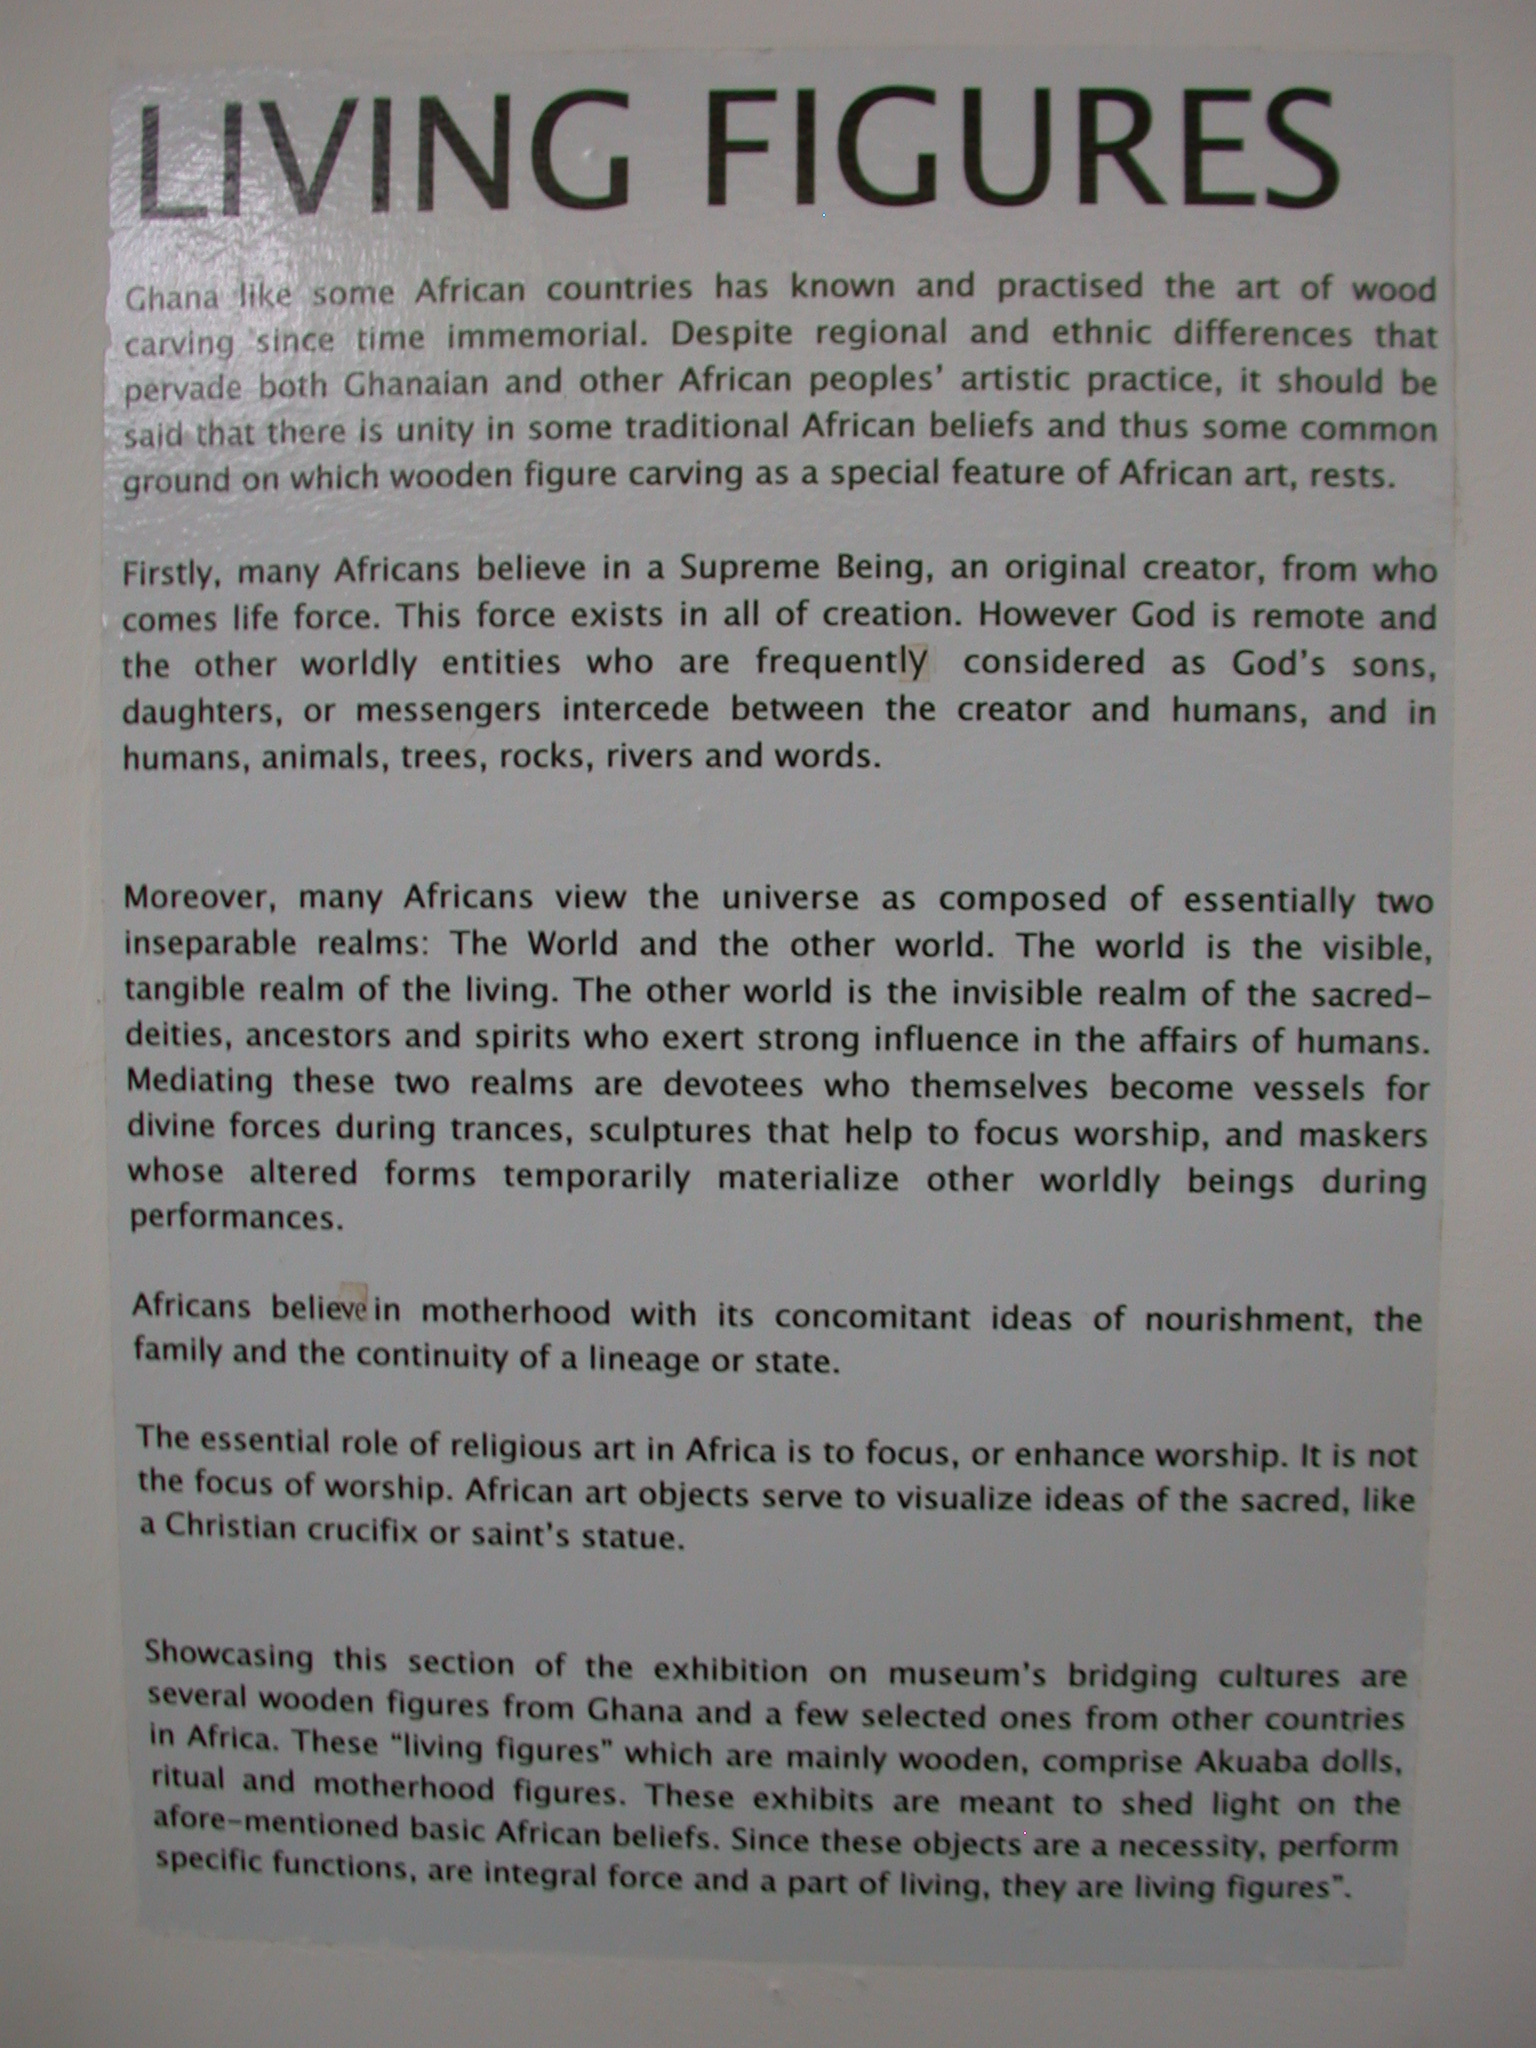 Living Figures Wooden Art Description, National Museum, Accra, Ghana